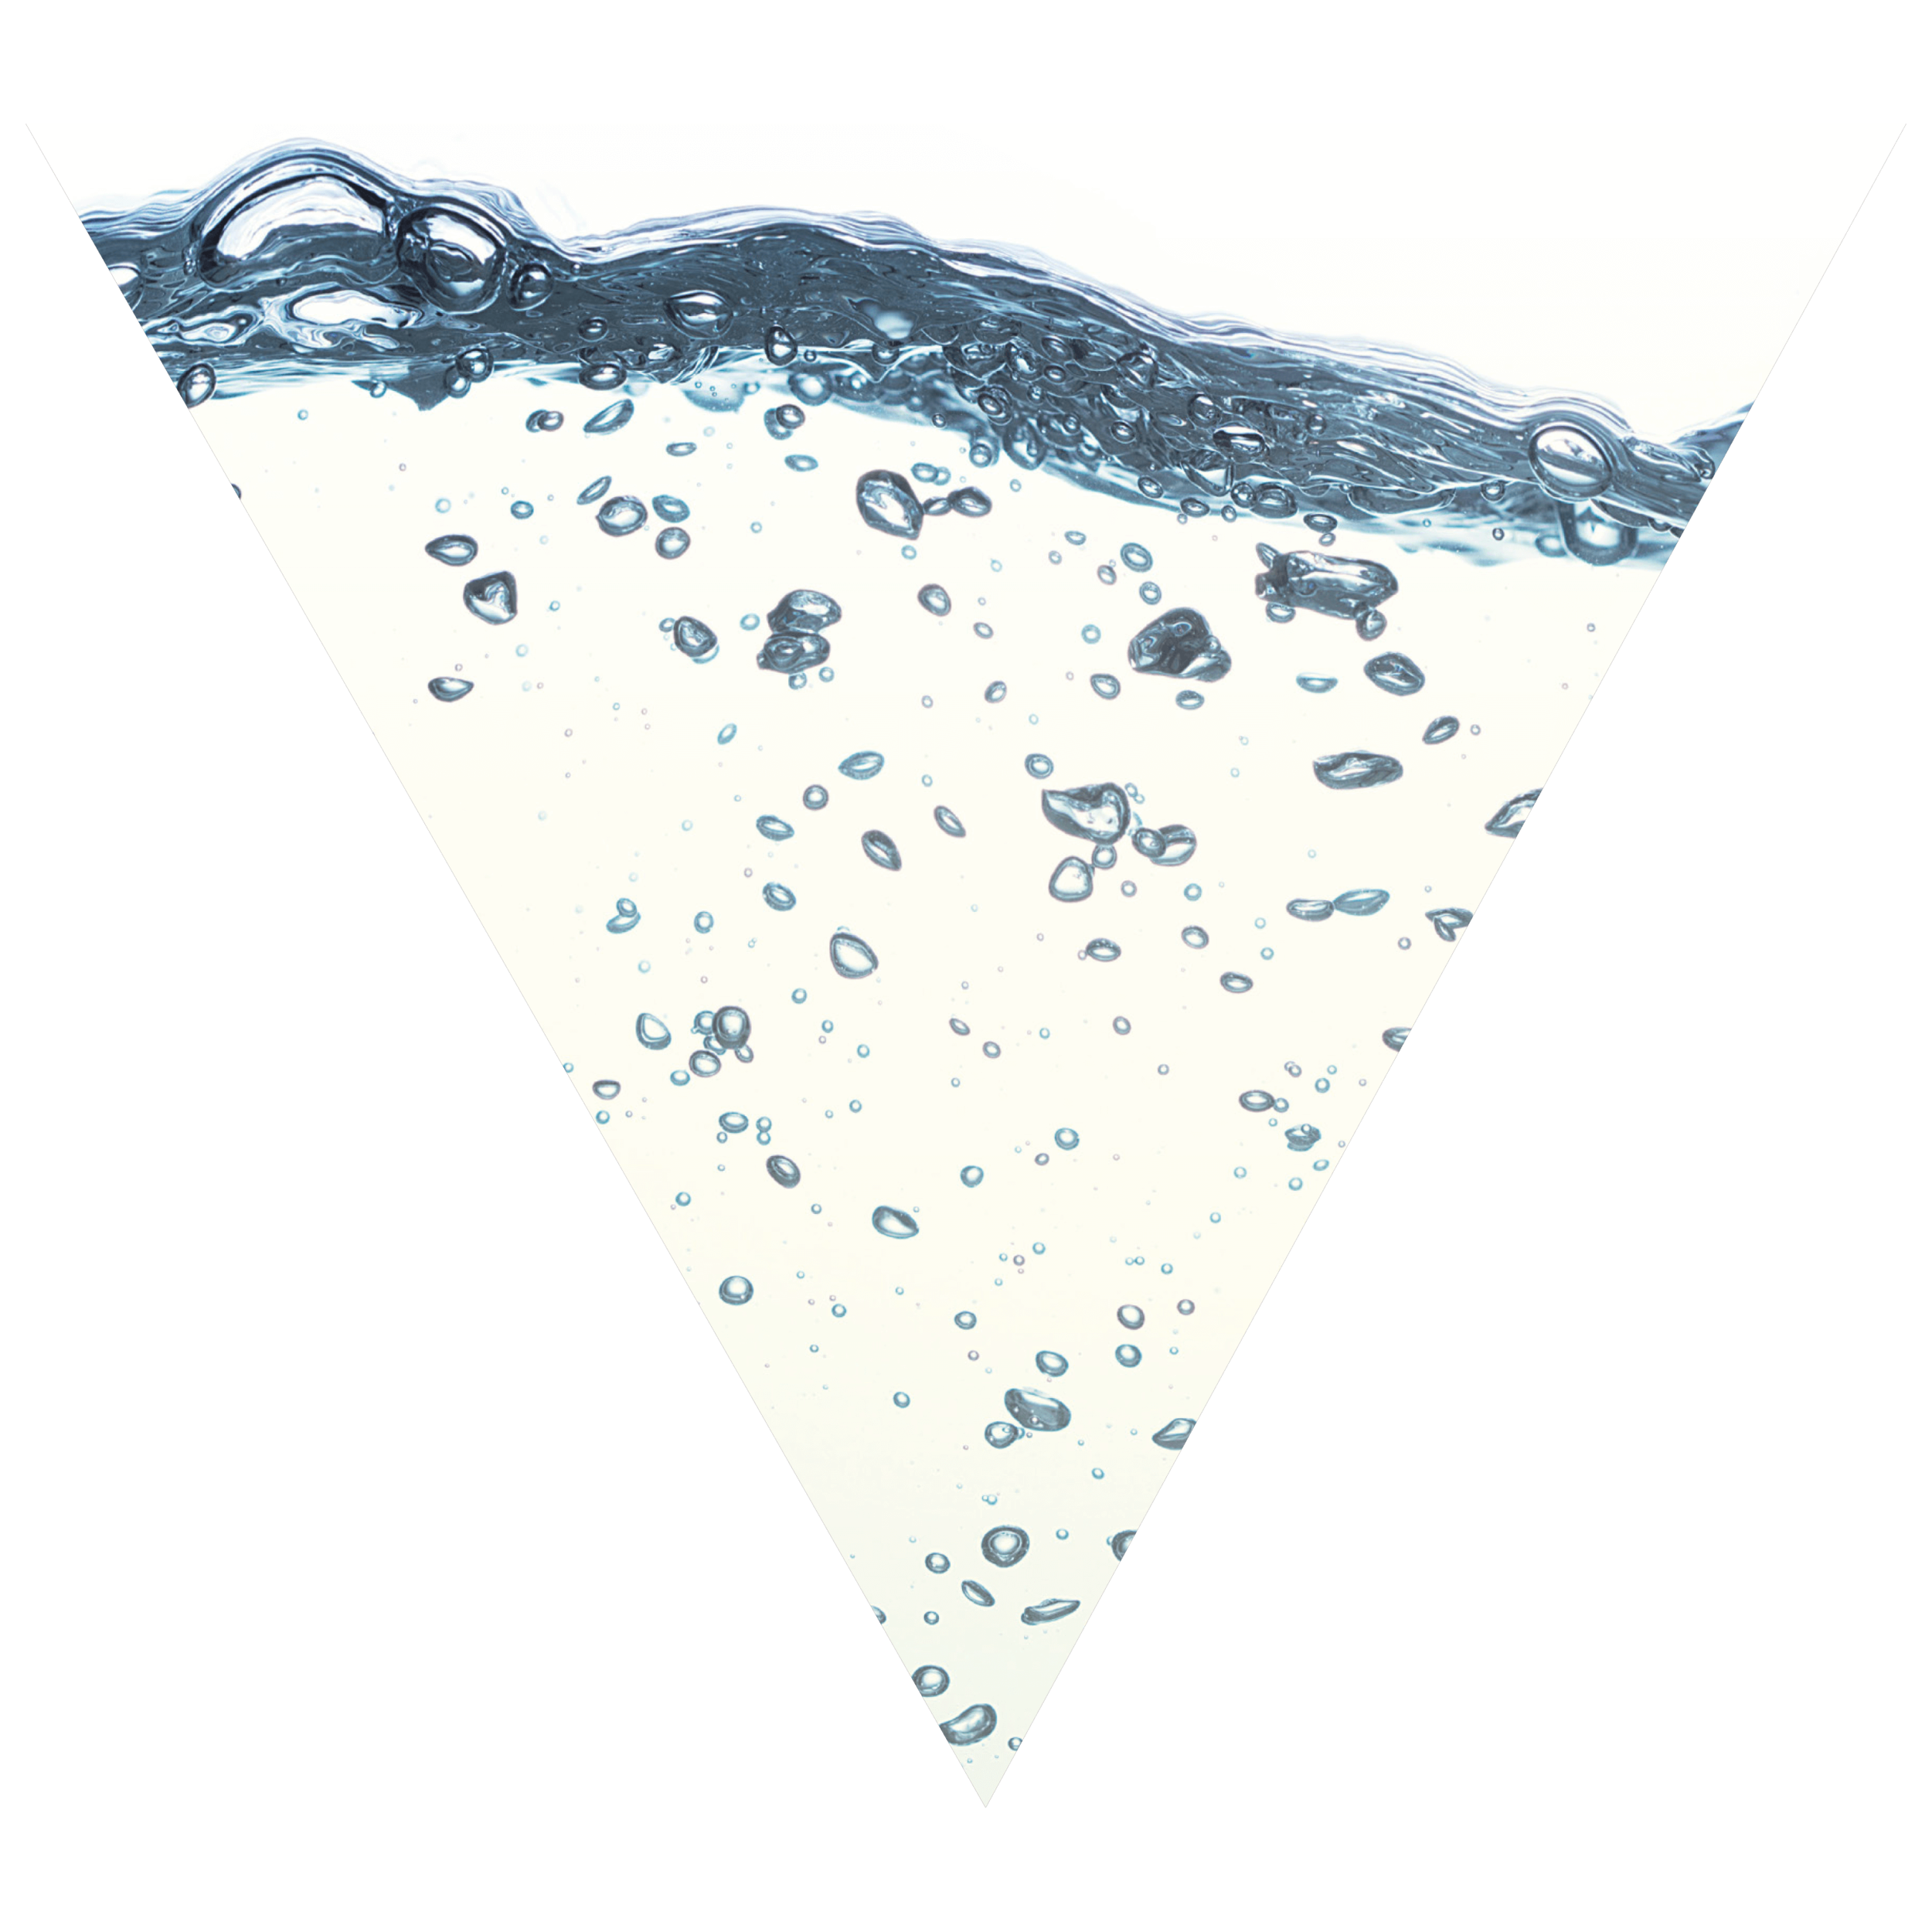 'V' Water Image.png